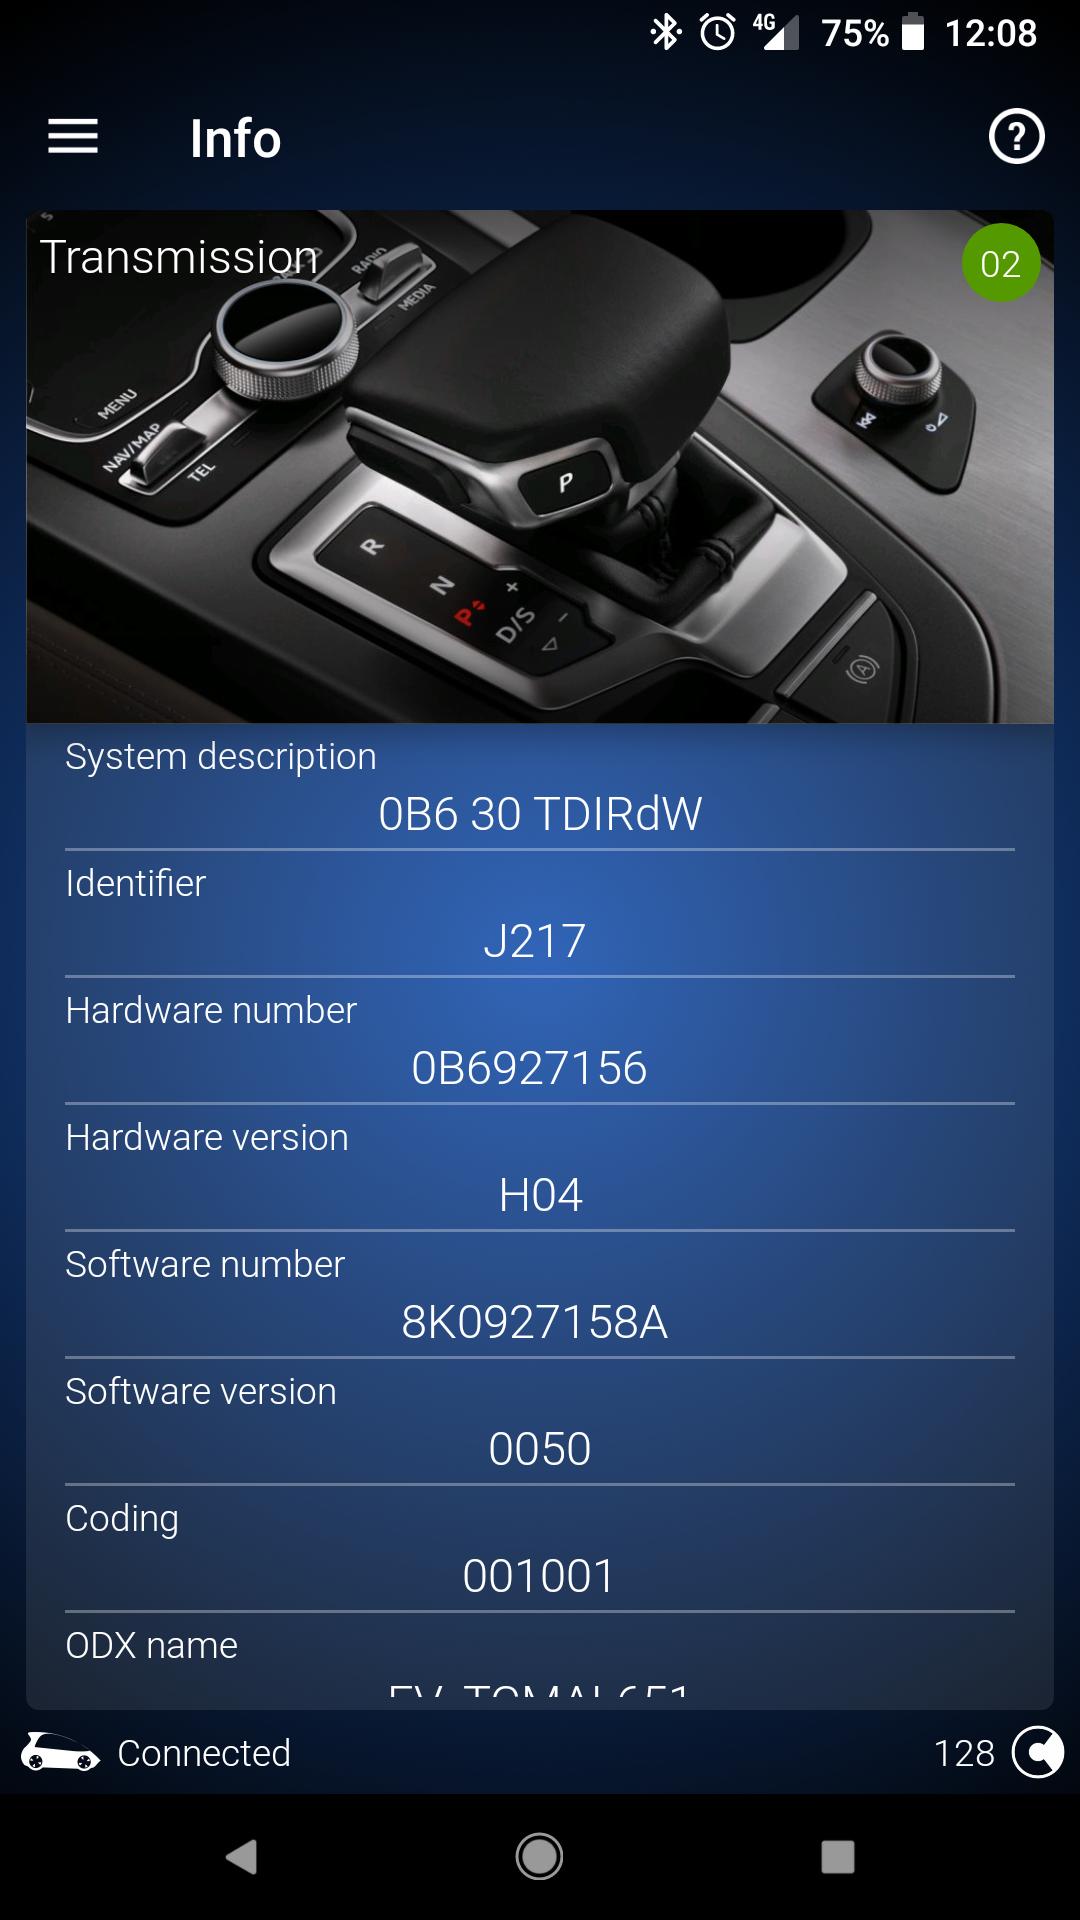 Screenshot_20180620-120844.png